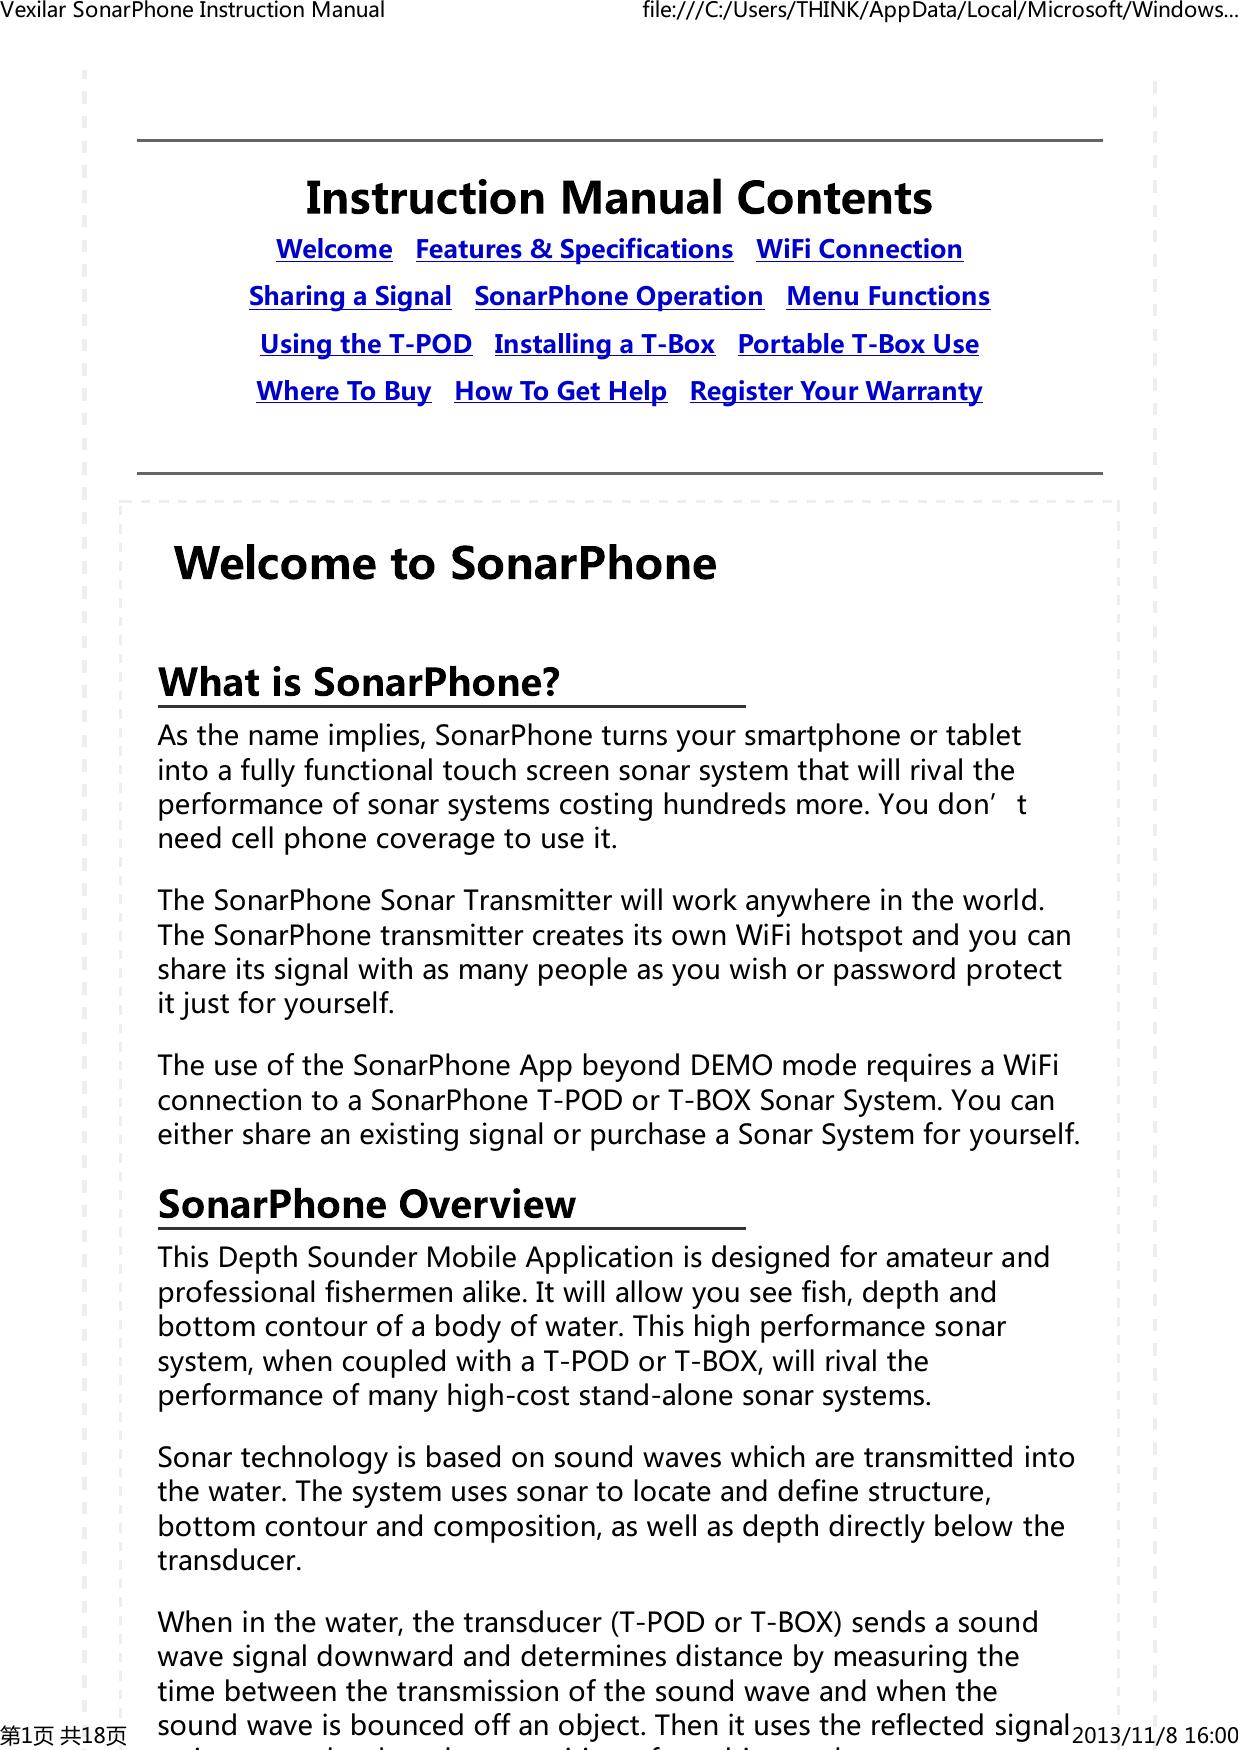 phiradar technology sp100 fish finder user manual vexilar sonarphone rh usermanual wiki Example User Guide Kindle Fire User Guide